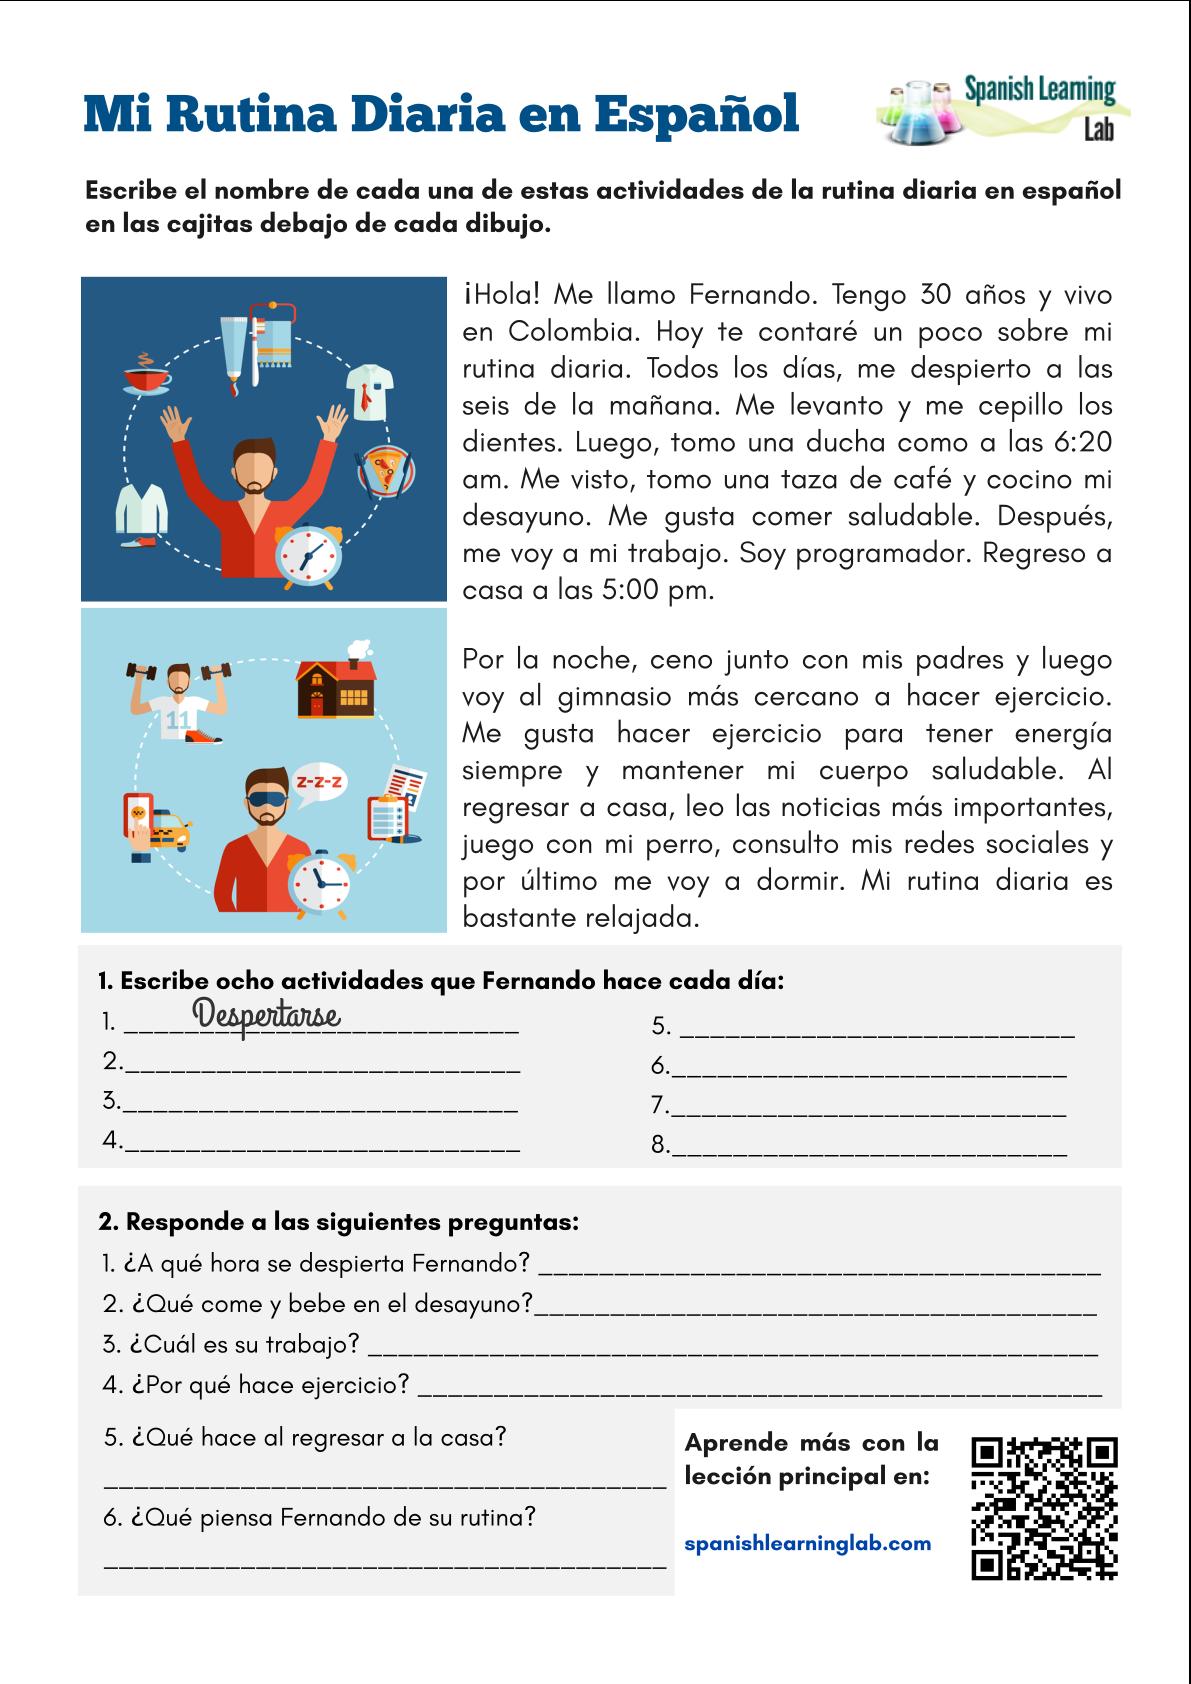 My Daily Routine In Spanish Pdf Worksheet Spanish Worksheets Spanish Learning Activities Spanish Teaching Resources [ 1684 x 1191 Pixel ]